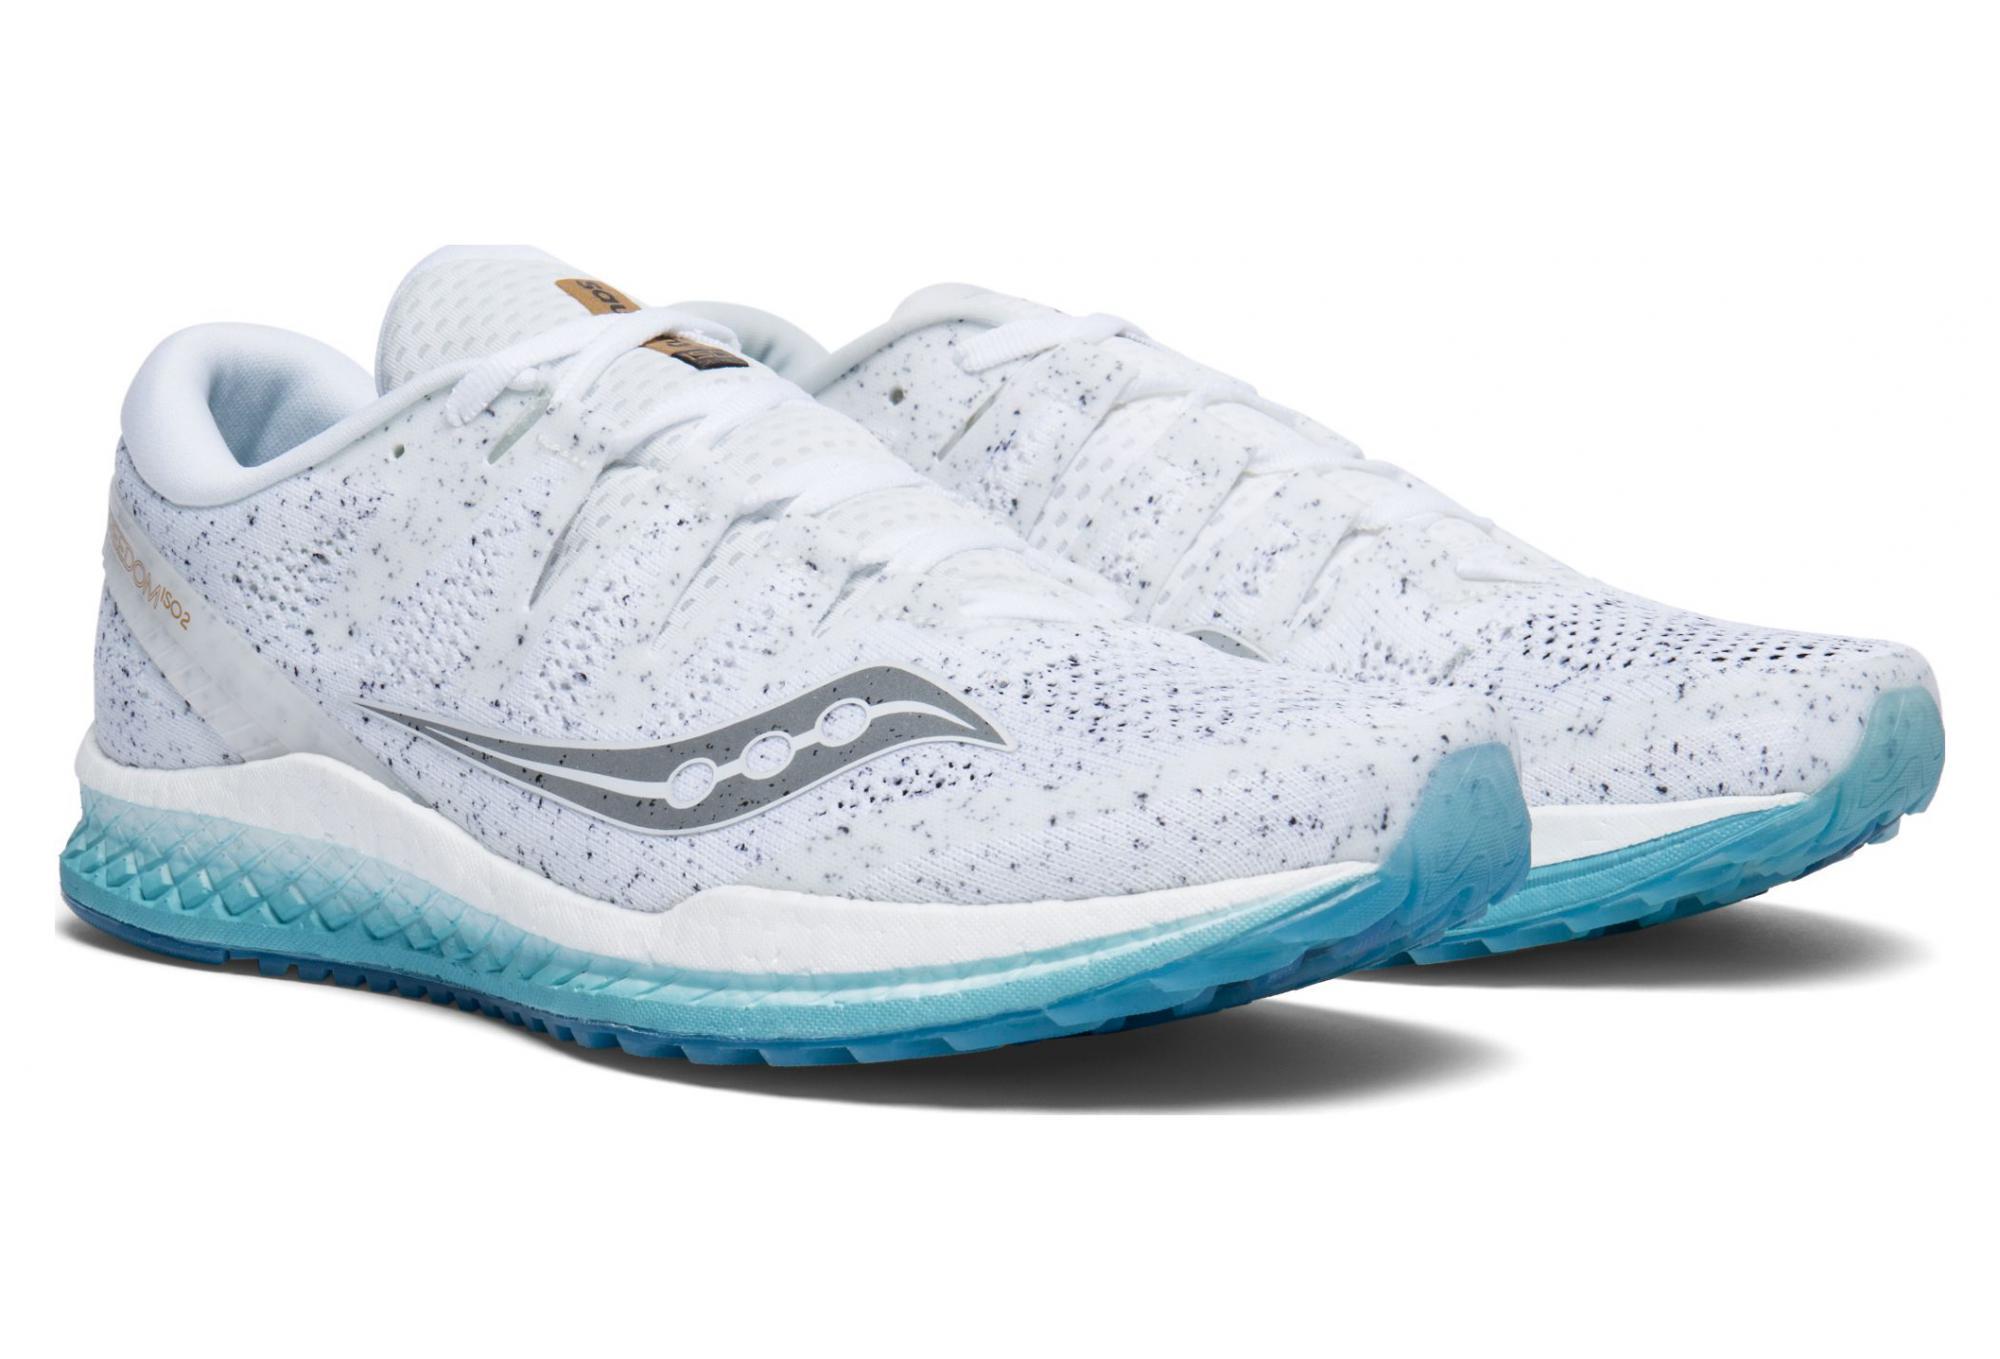 c8e25b63 Saucony Freedom Iso 2 Shoes White Noise | Alltricks.com